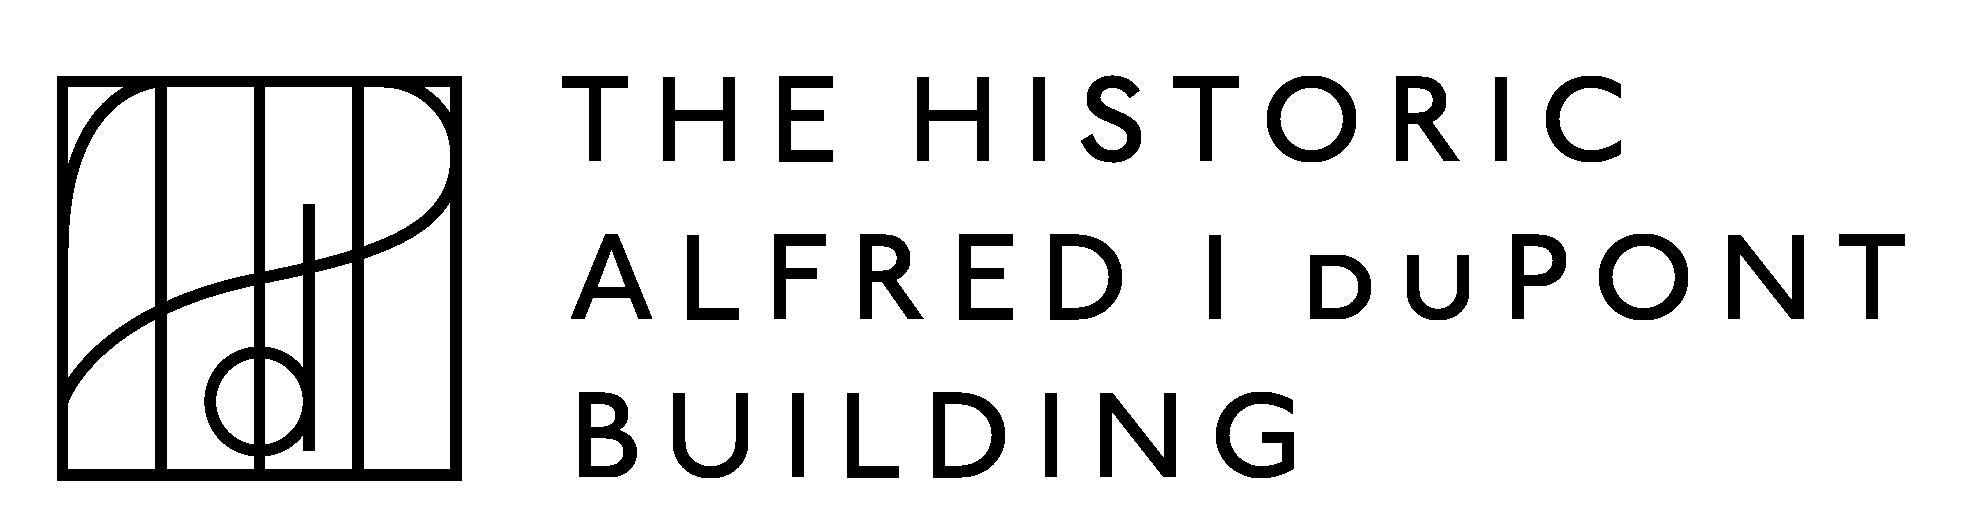 Large_Logo w text_Black